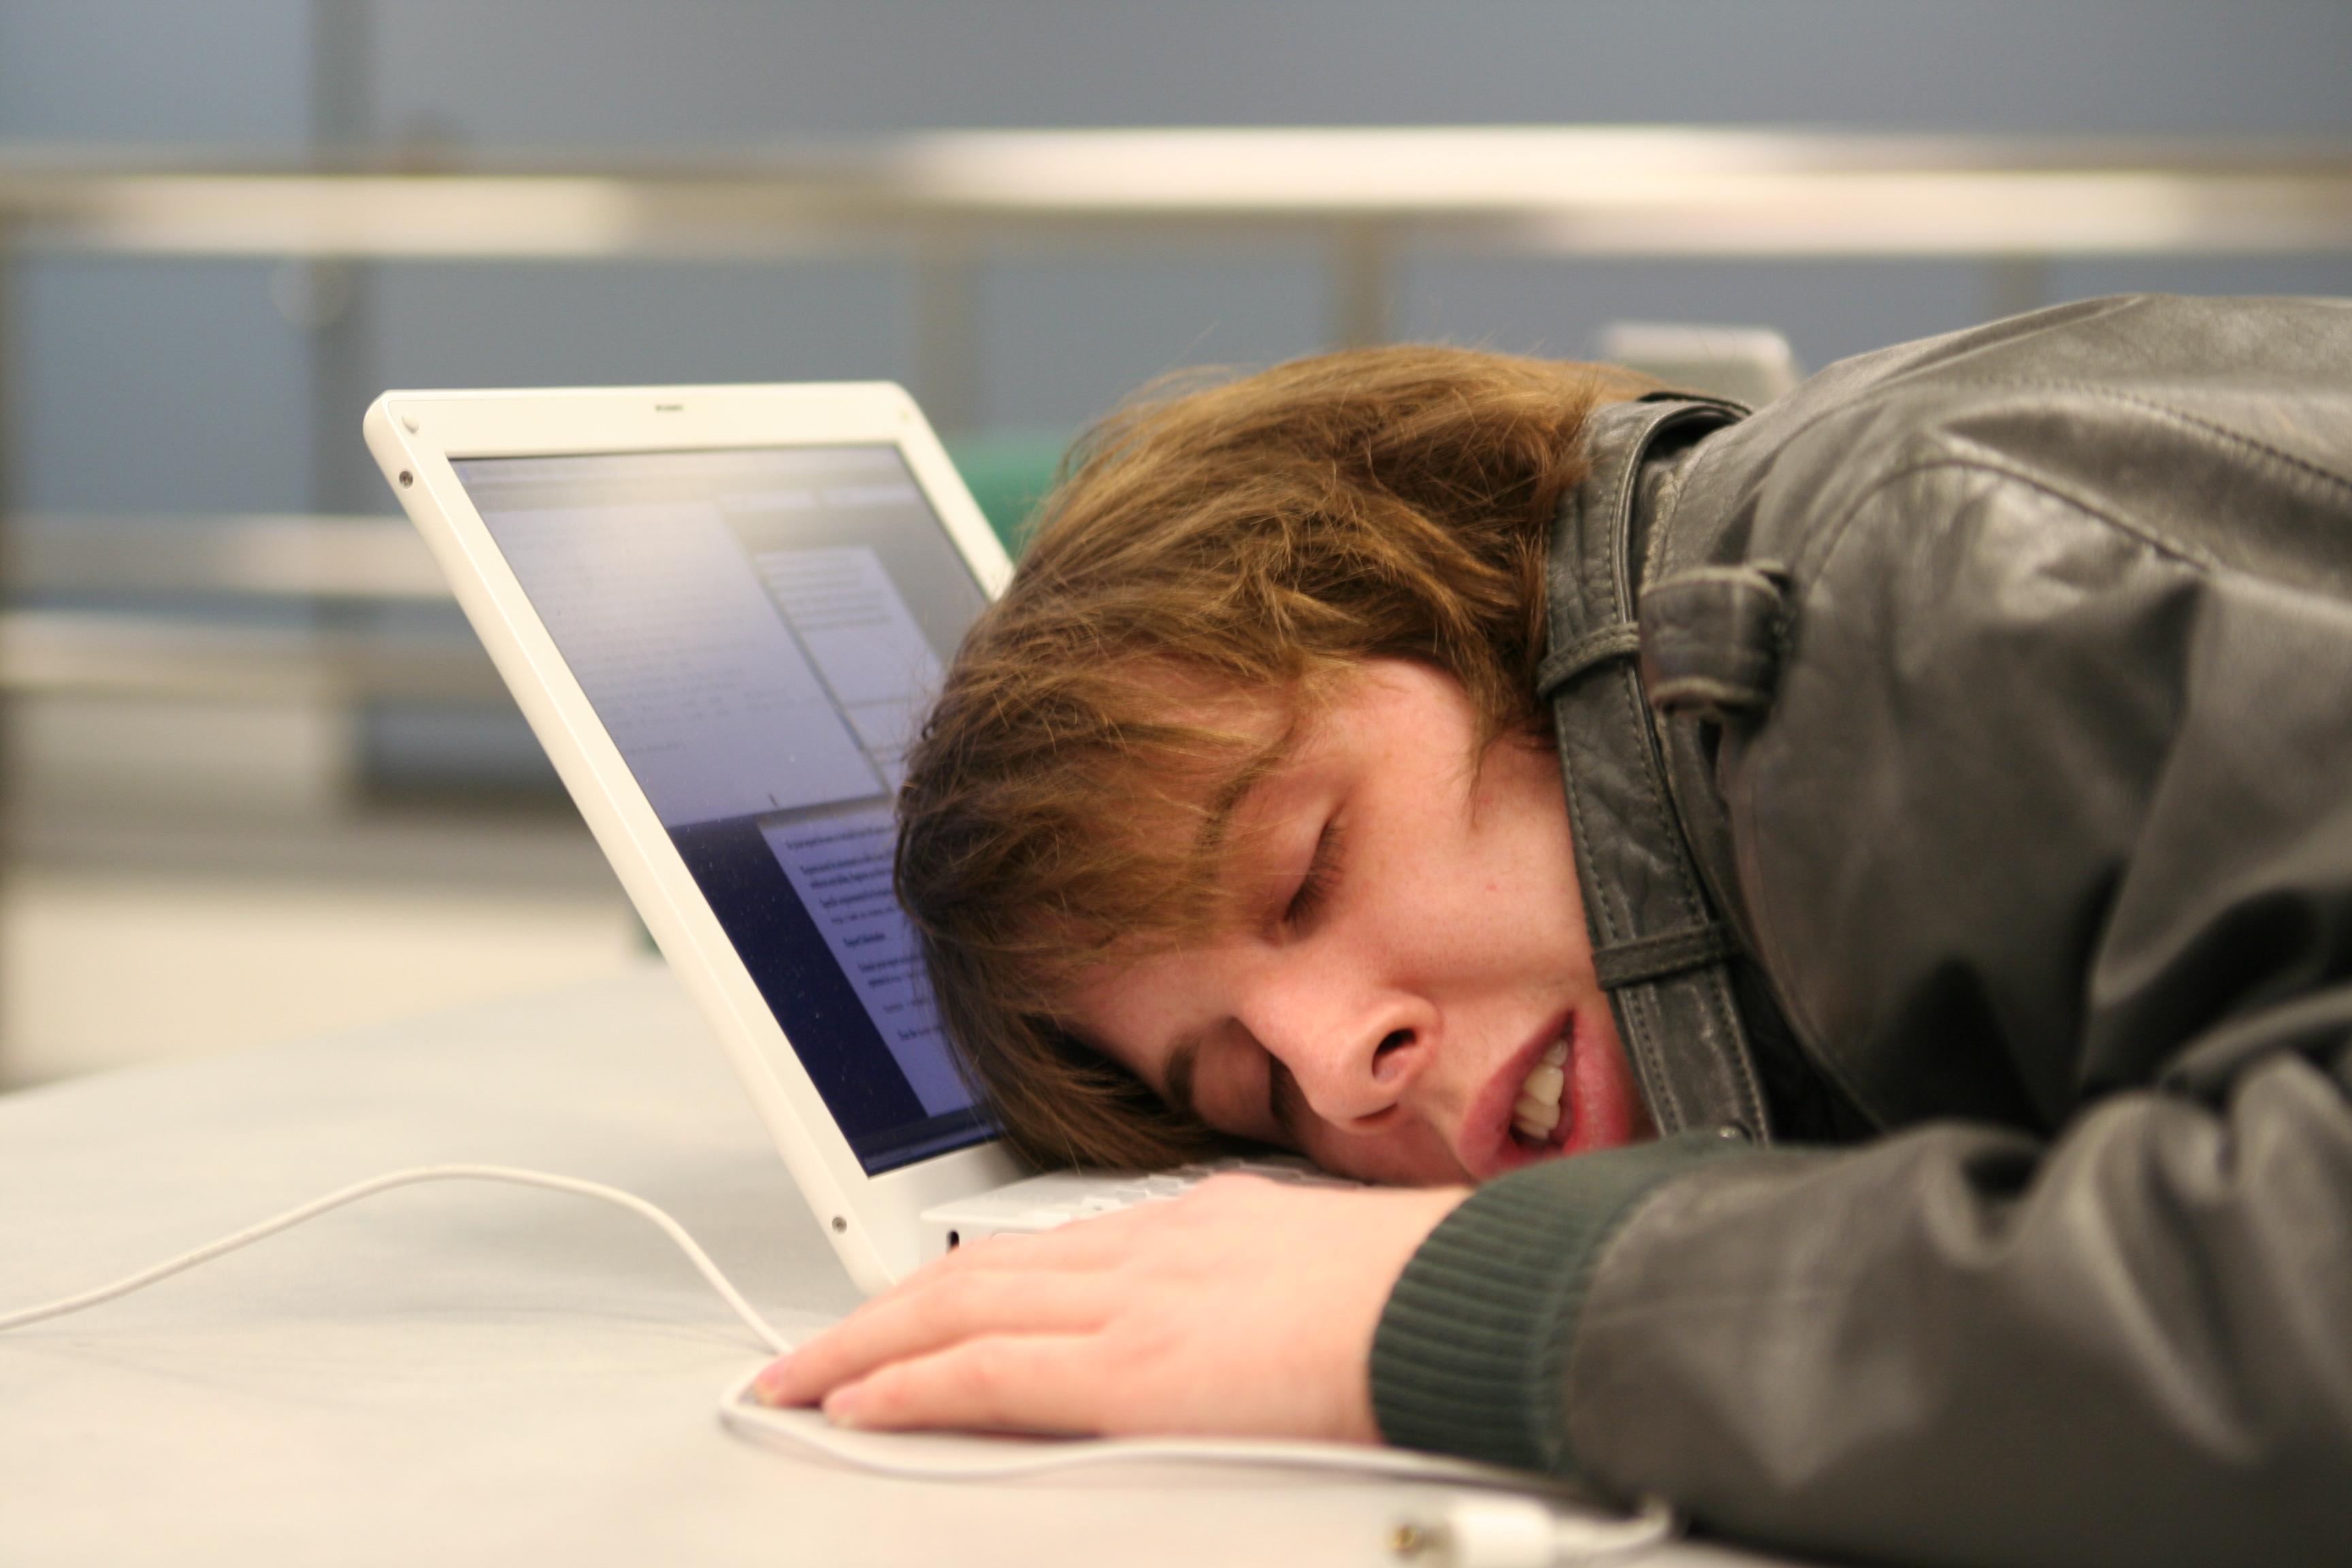 заснул за компьютером картинка начала